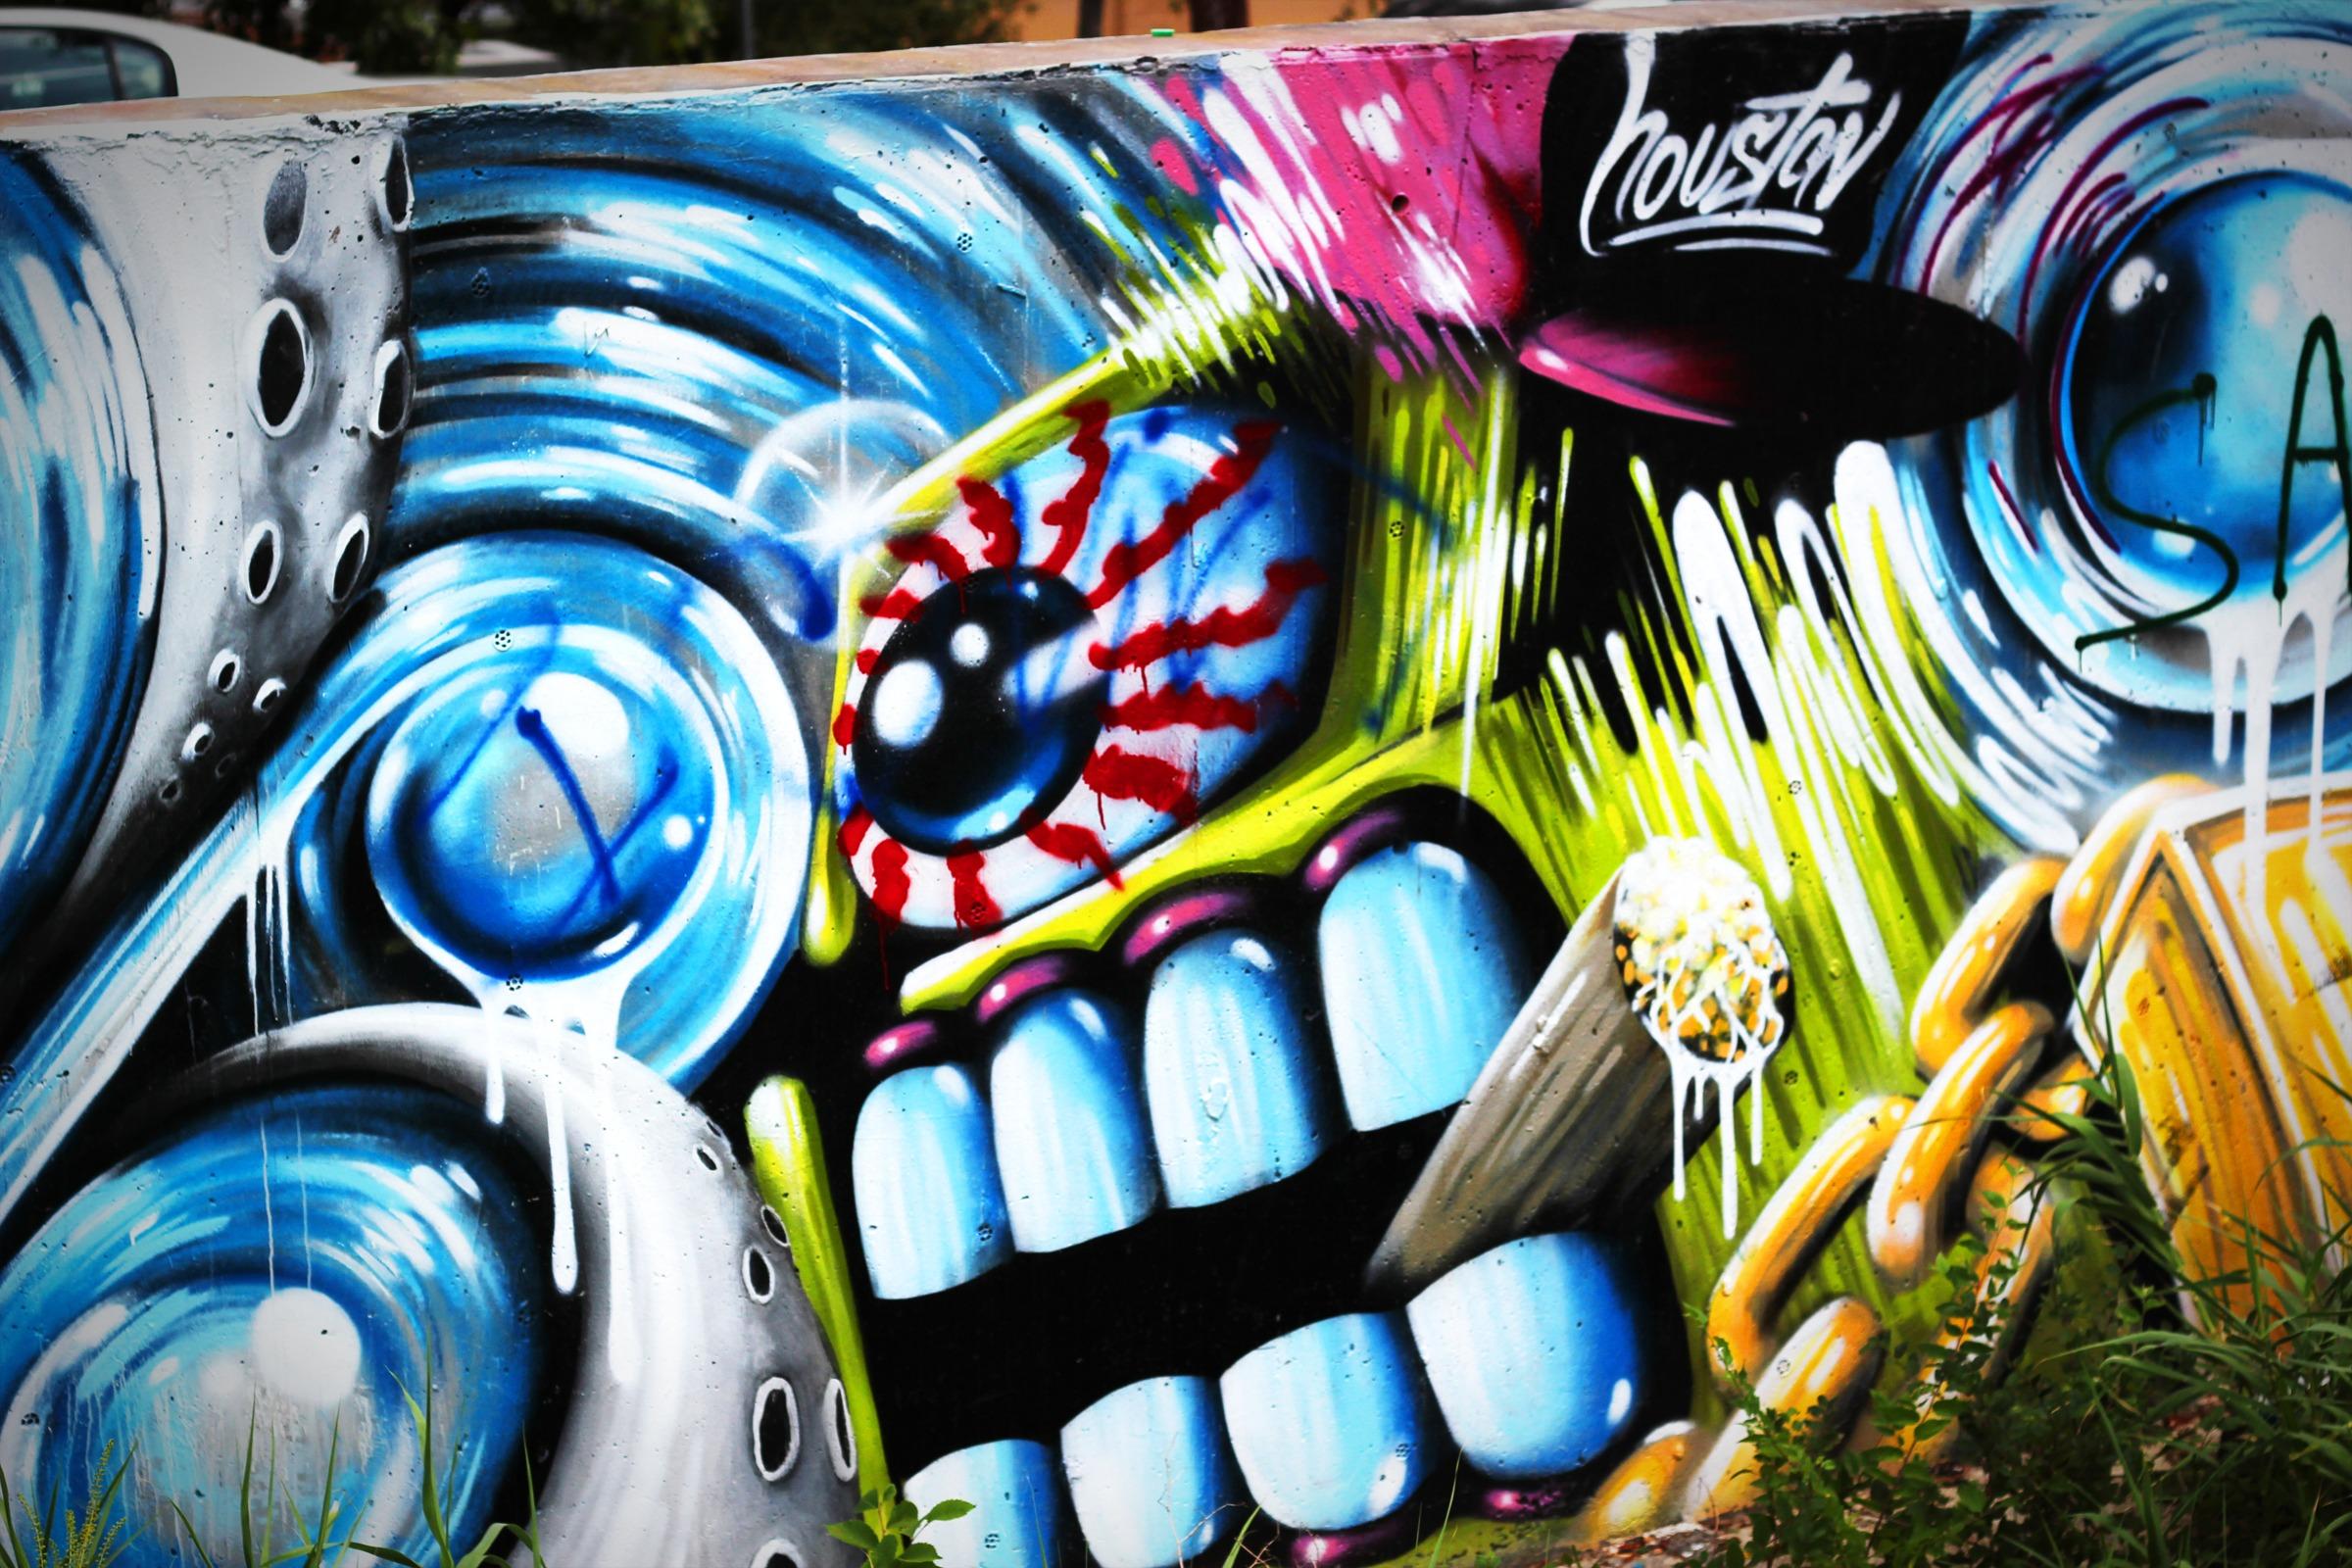 Street Wall Spray Color Artistic Paint Graffiti Street Art Art Illustration Design Mural Spray Paint Modern